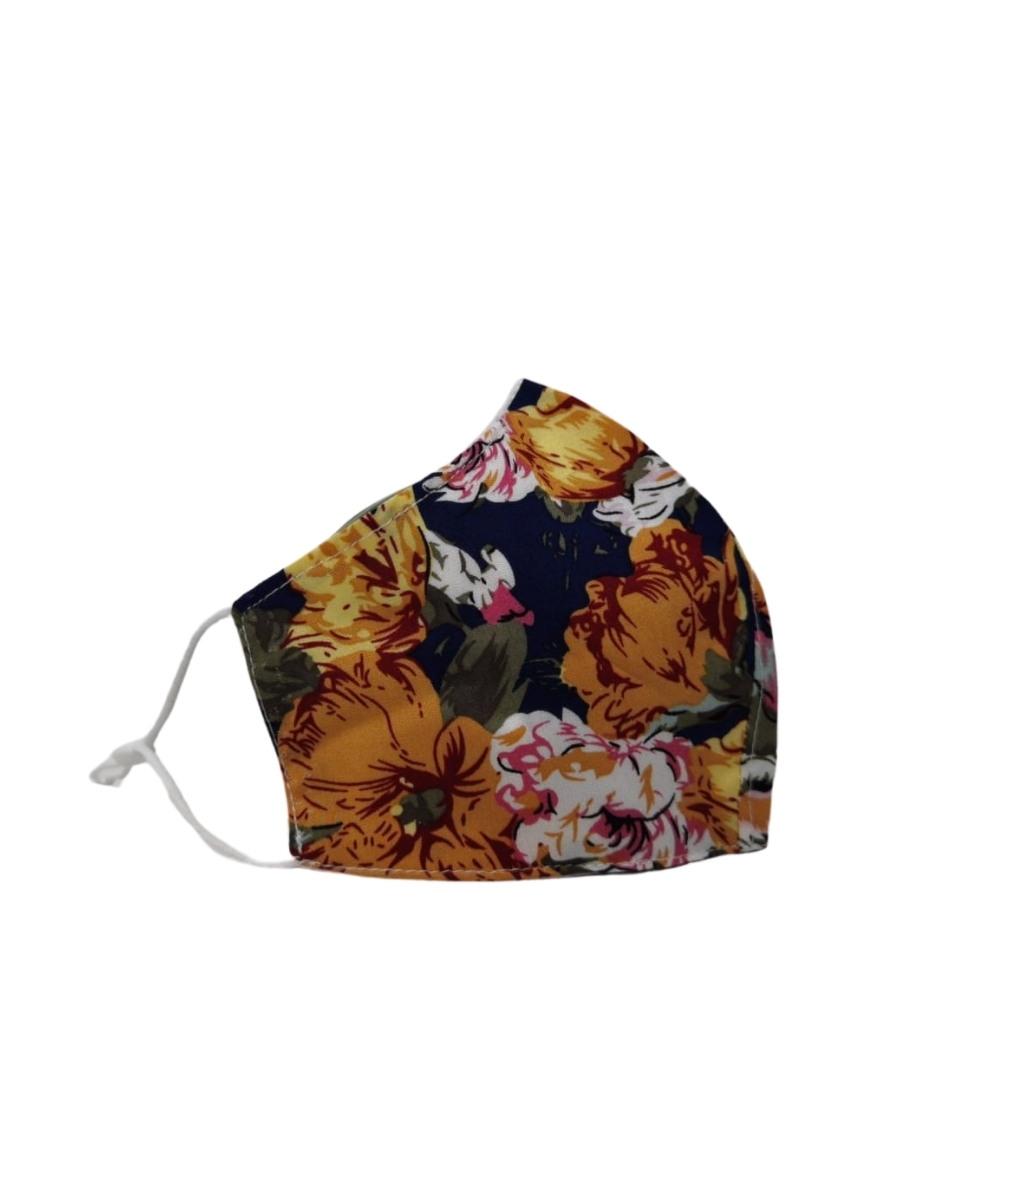 RENE MASK - YELLOW FLOWERS